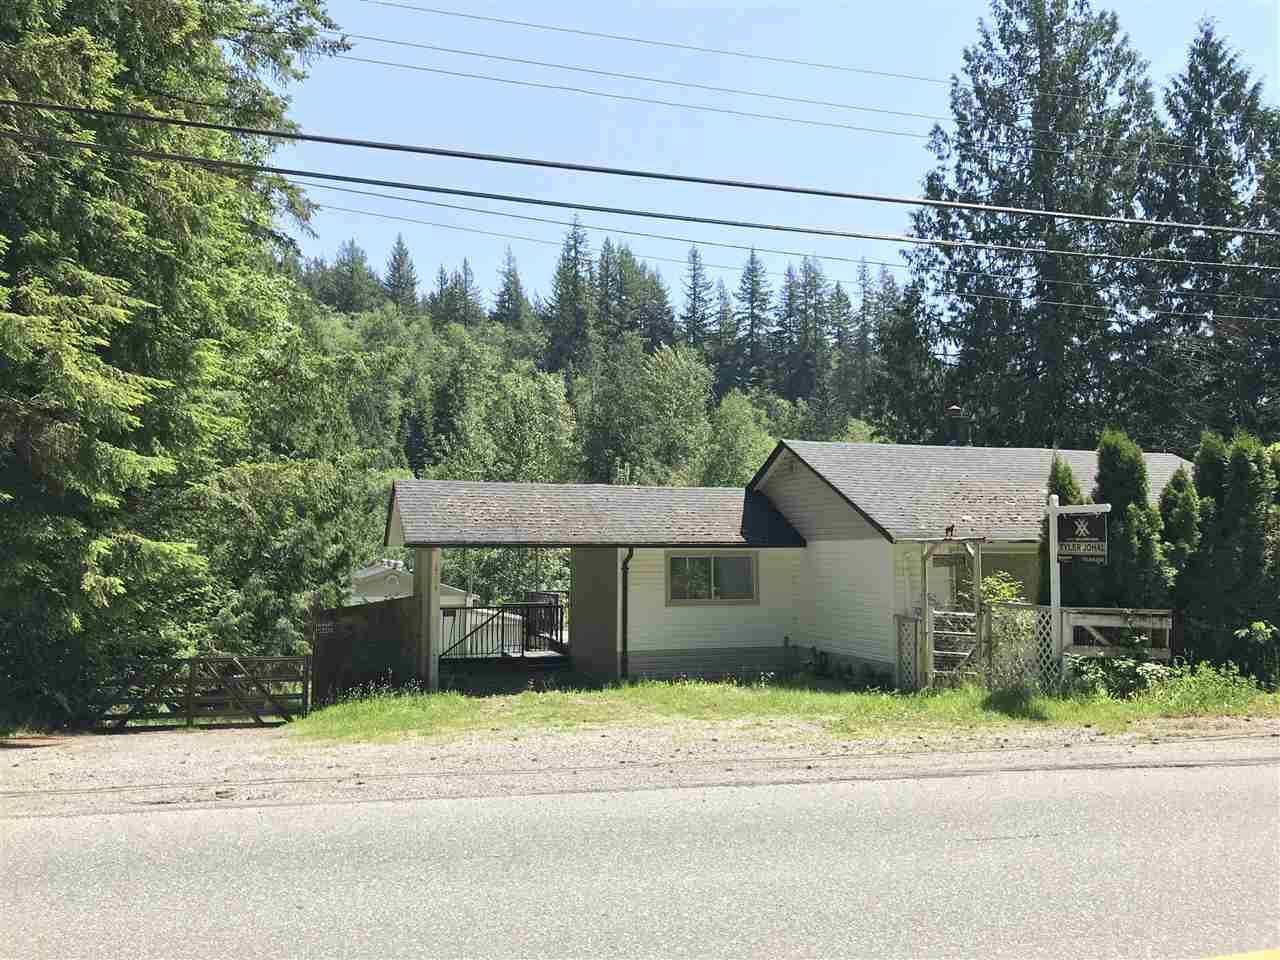 Main Photo: 11840 284 Street in Maple Ridge: Whonnock House for sale : MLS®# R2374042